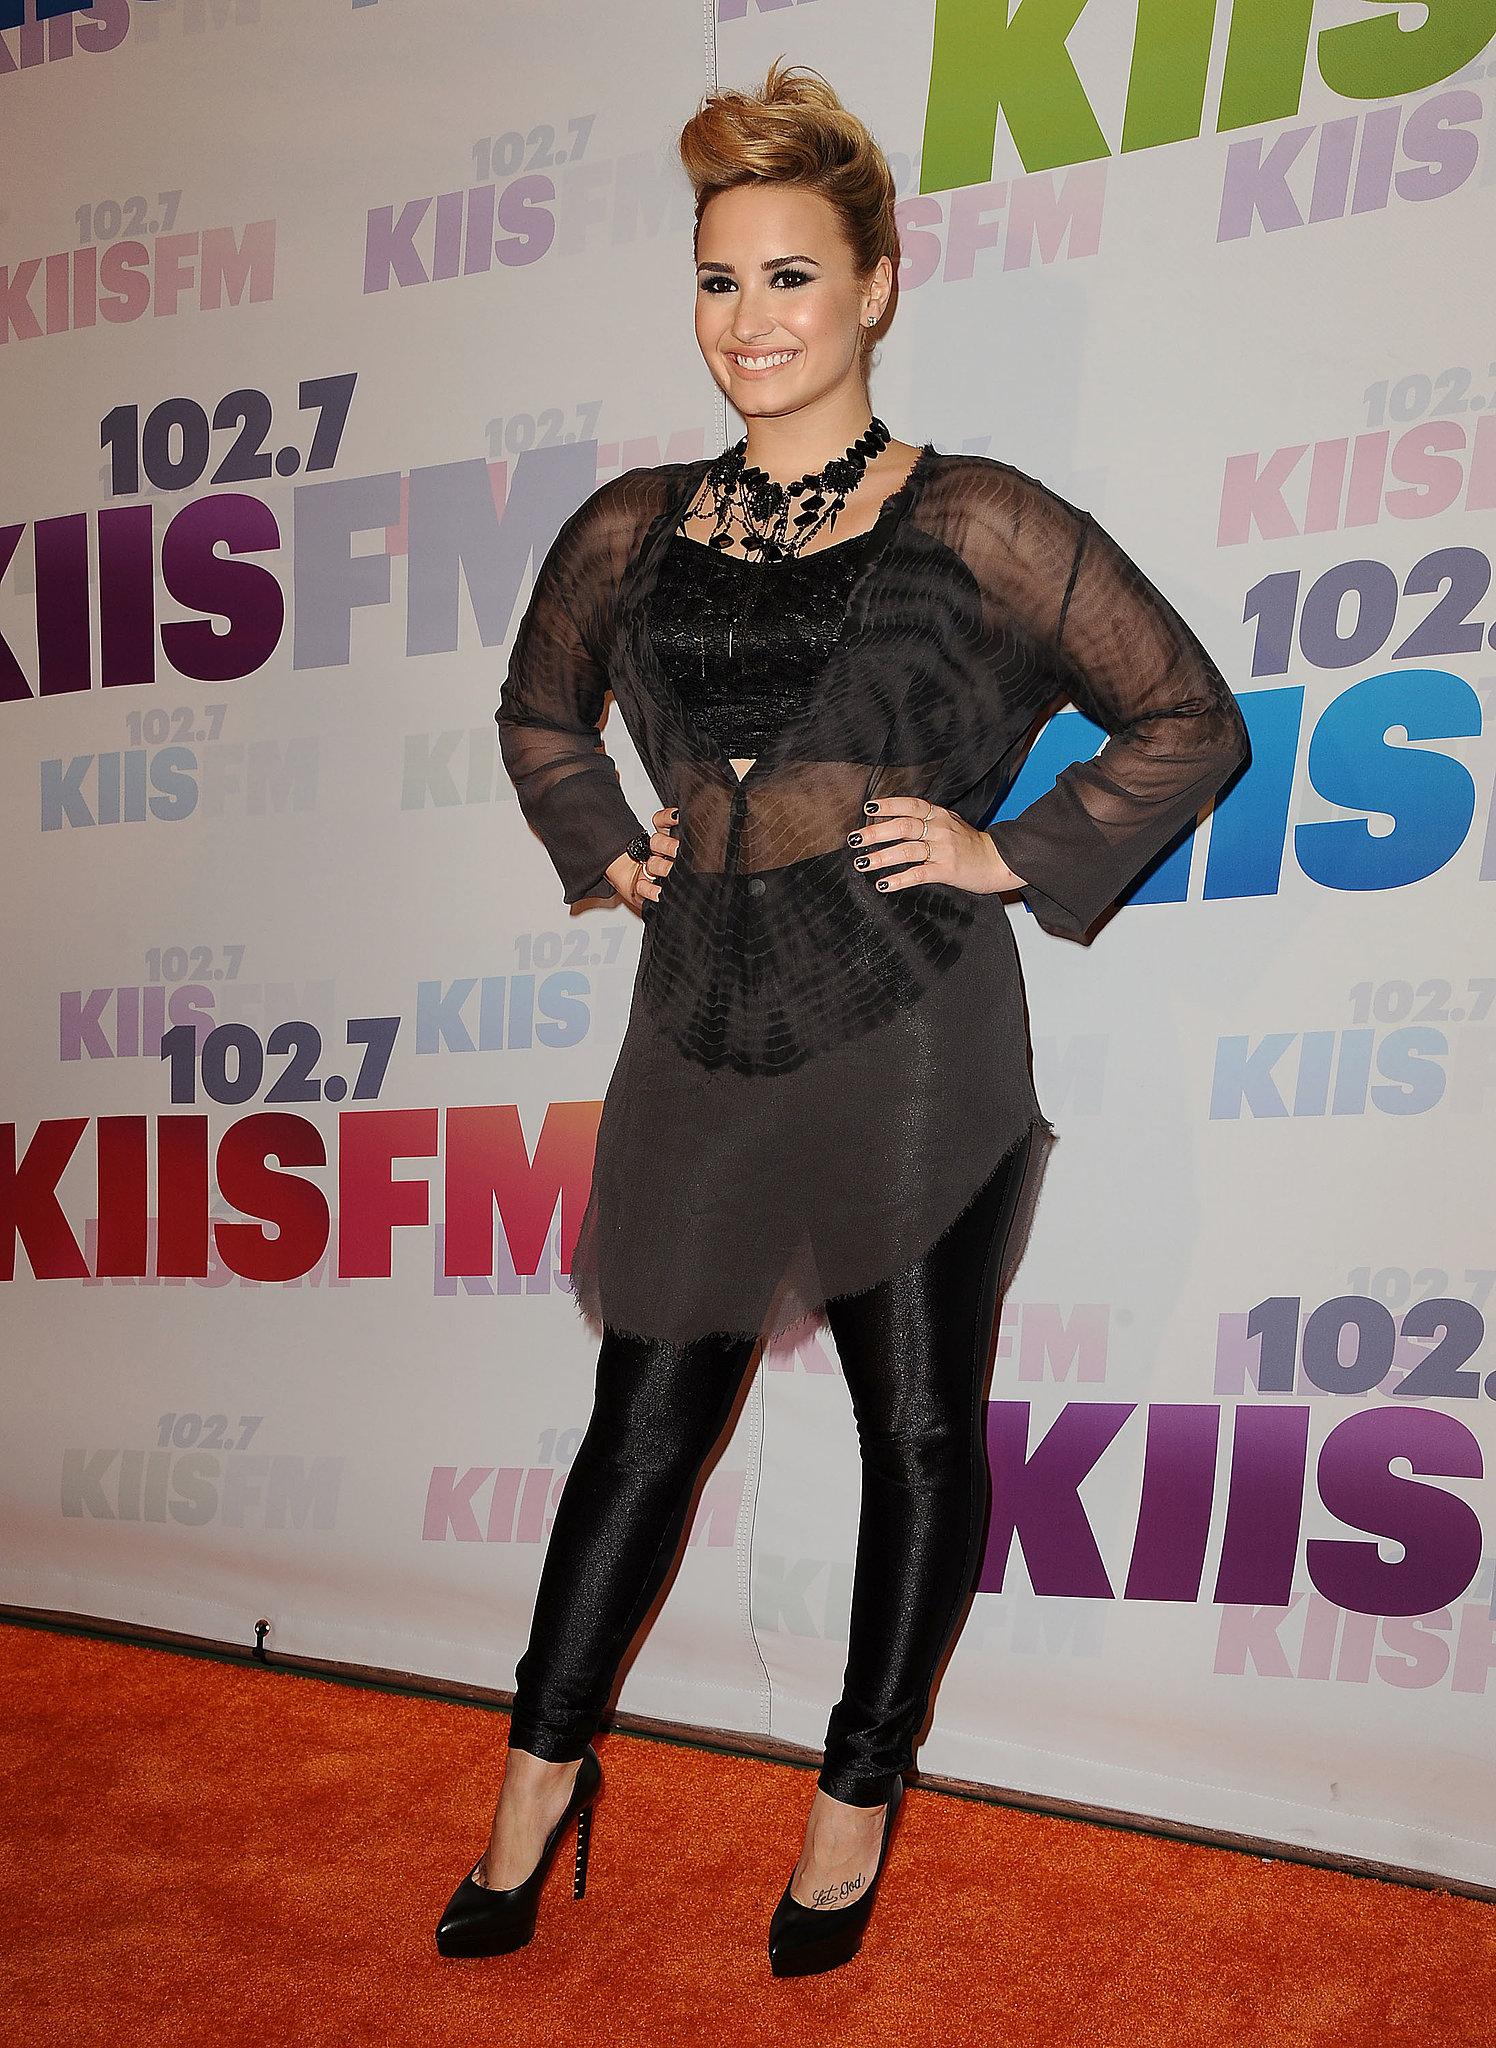 Demi Lovato wore a sheer top.